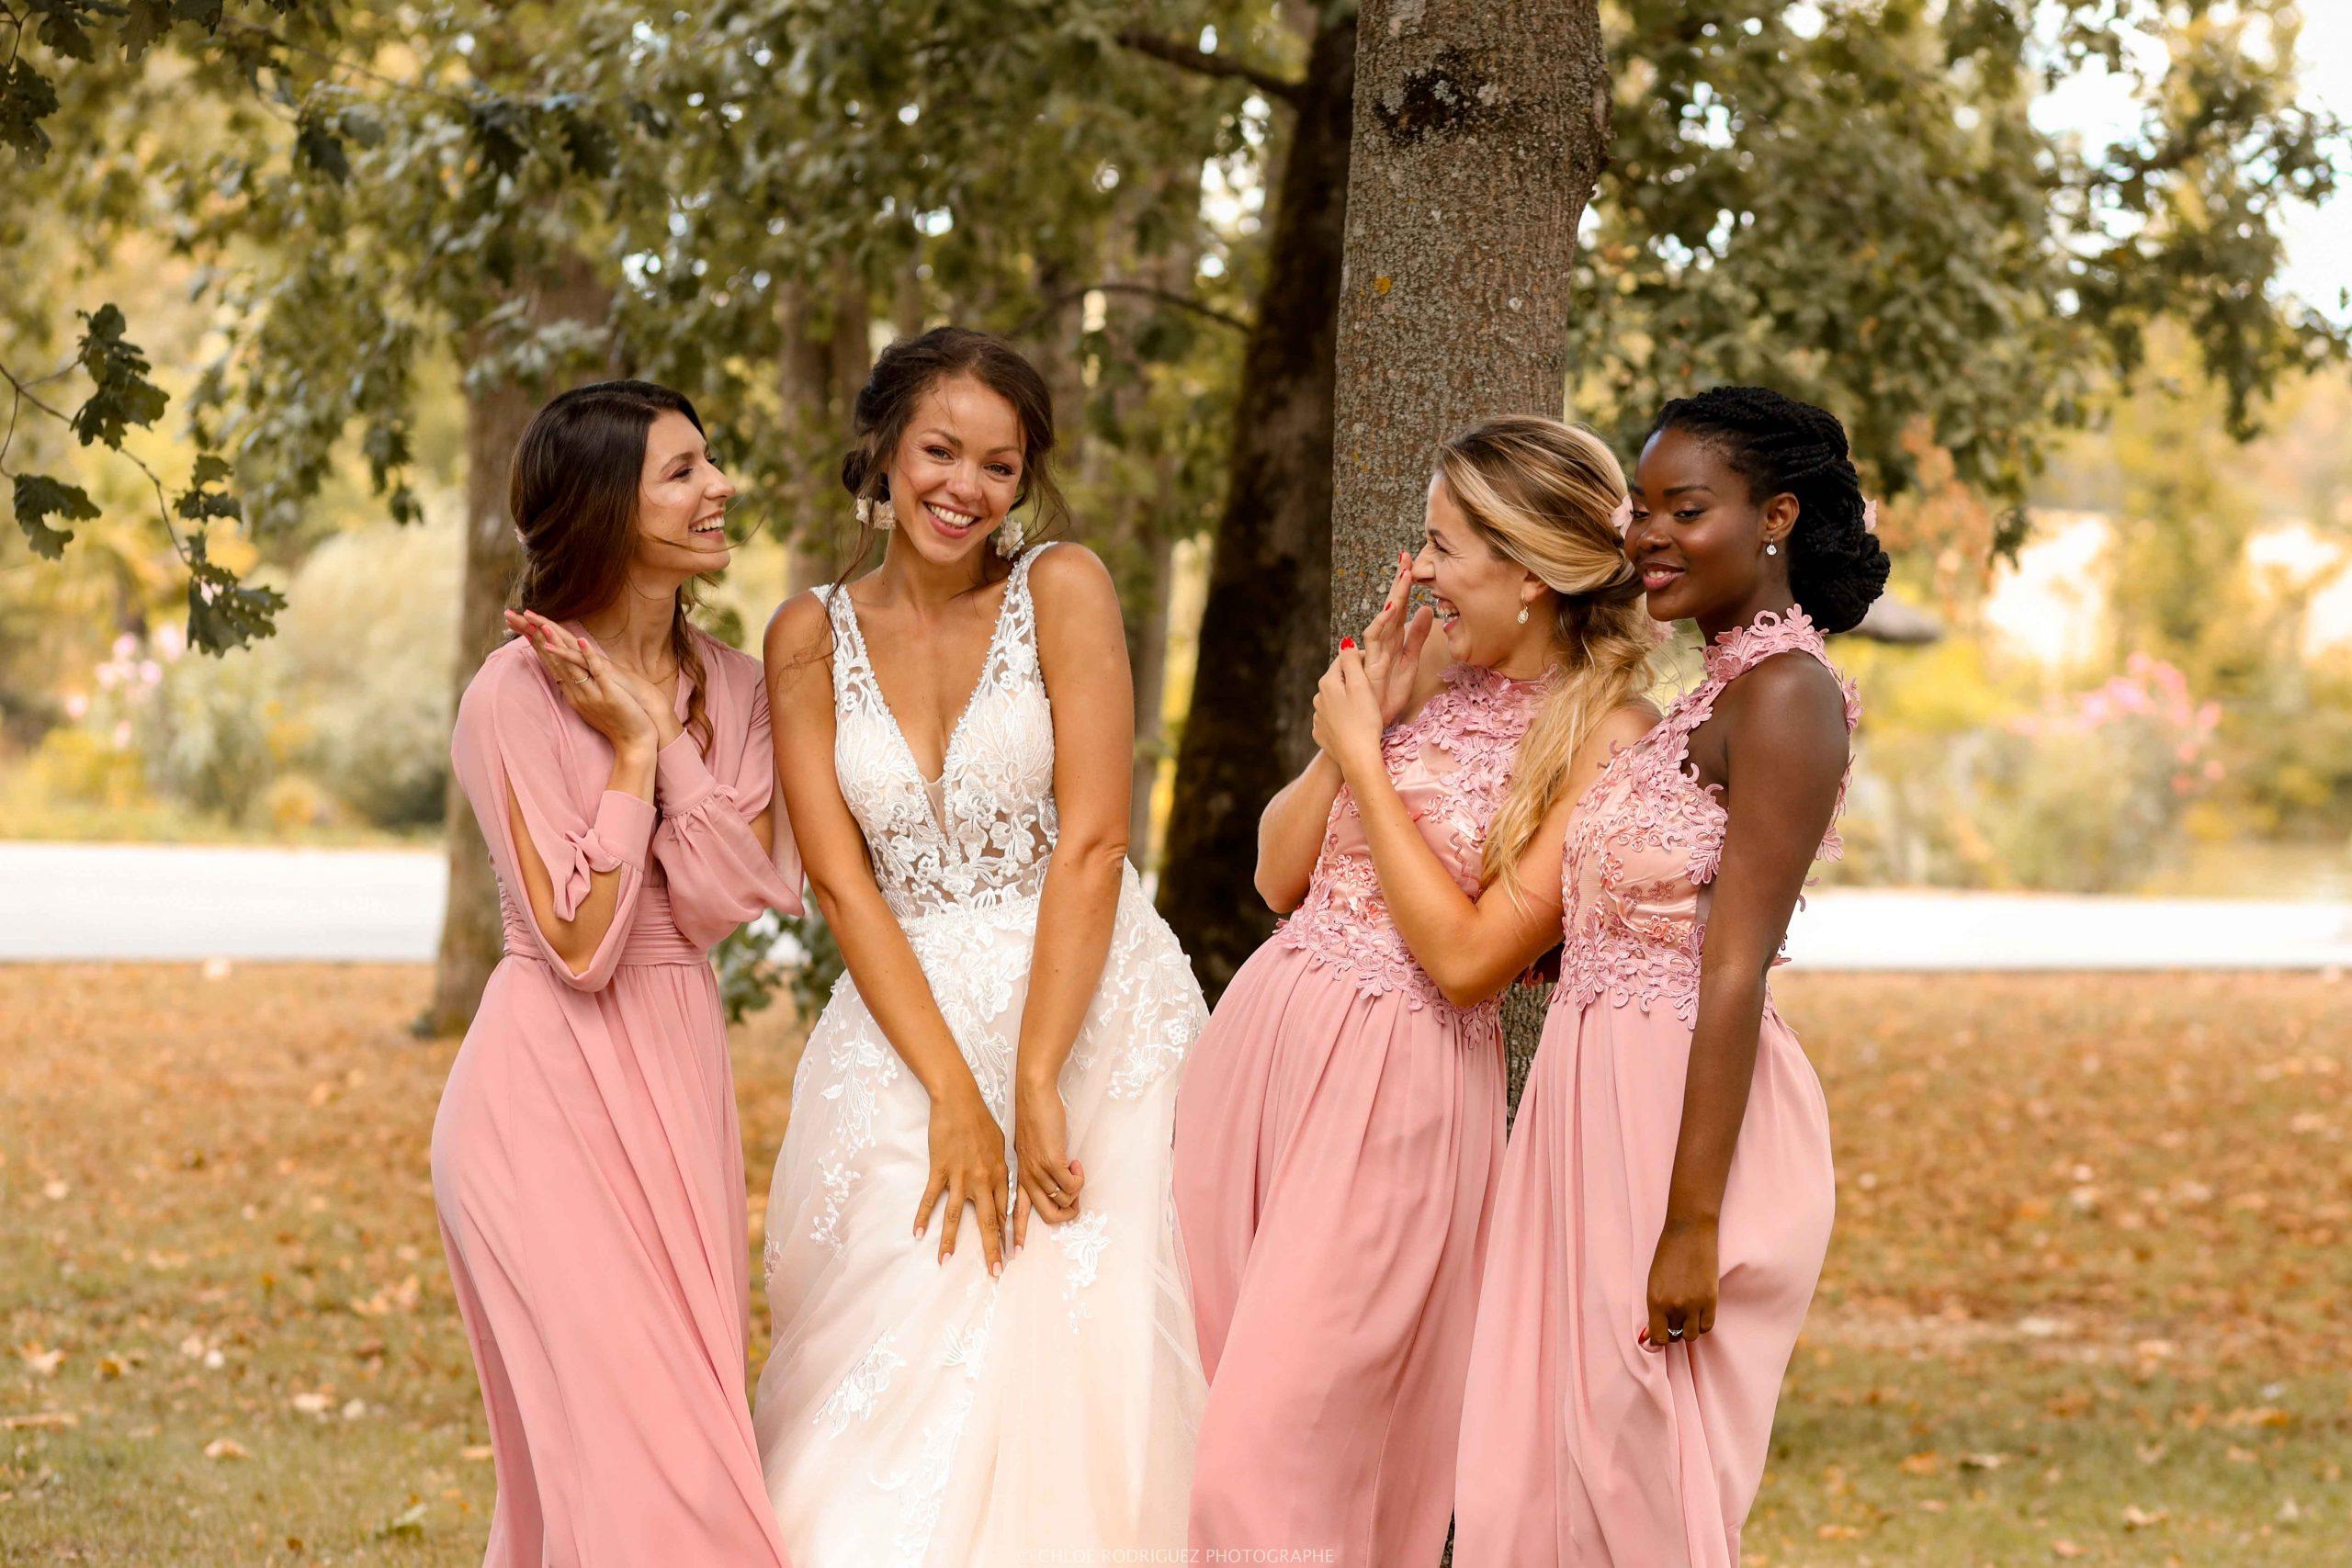 photographe mariages mariée souriante